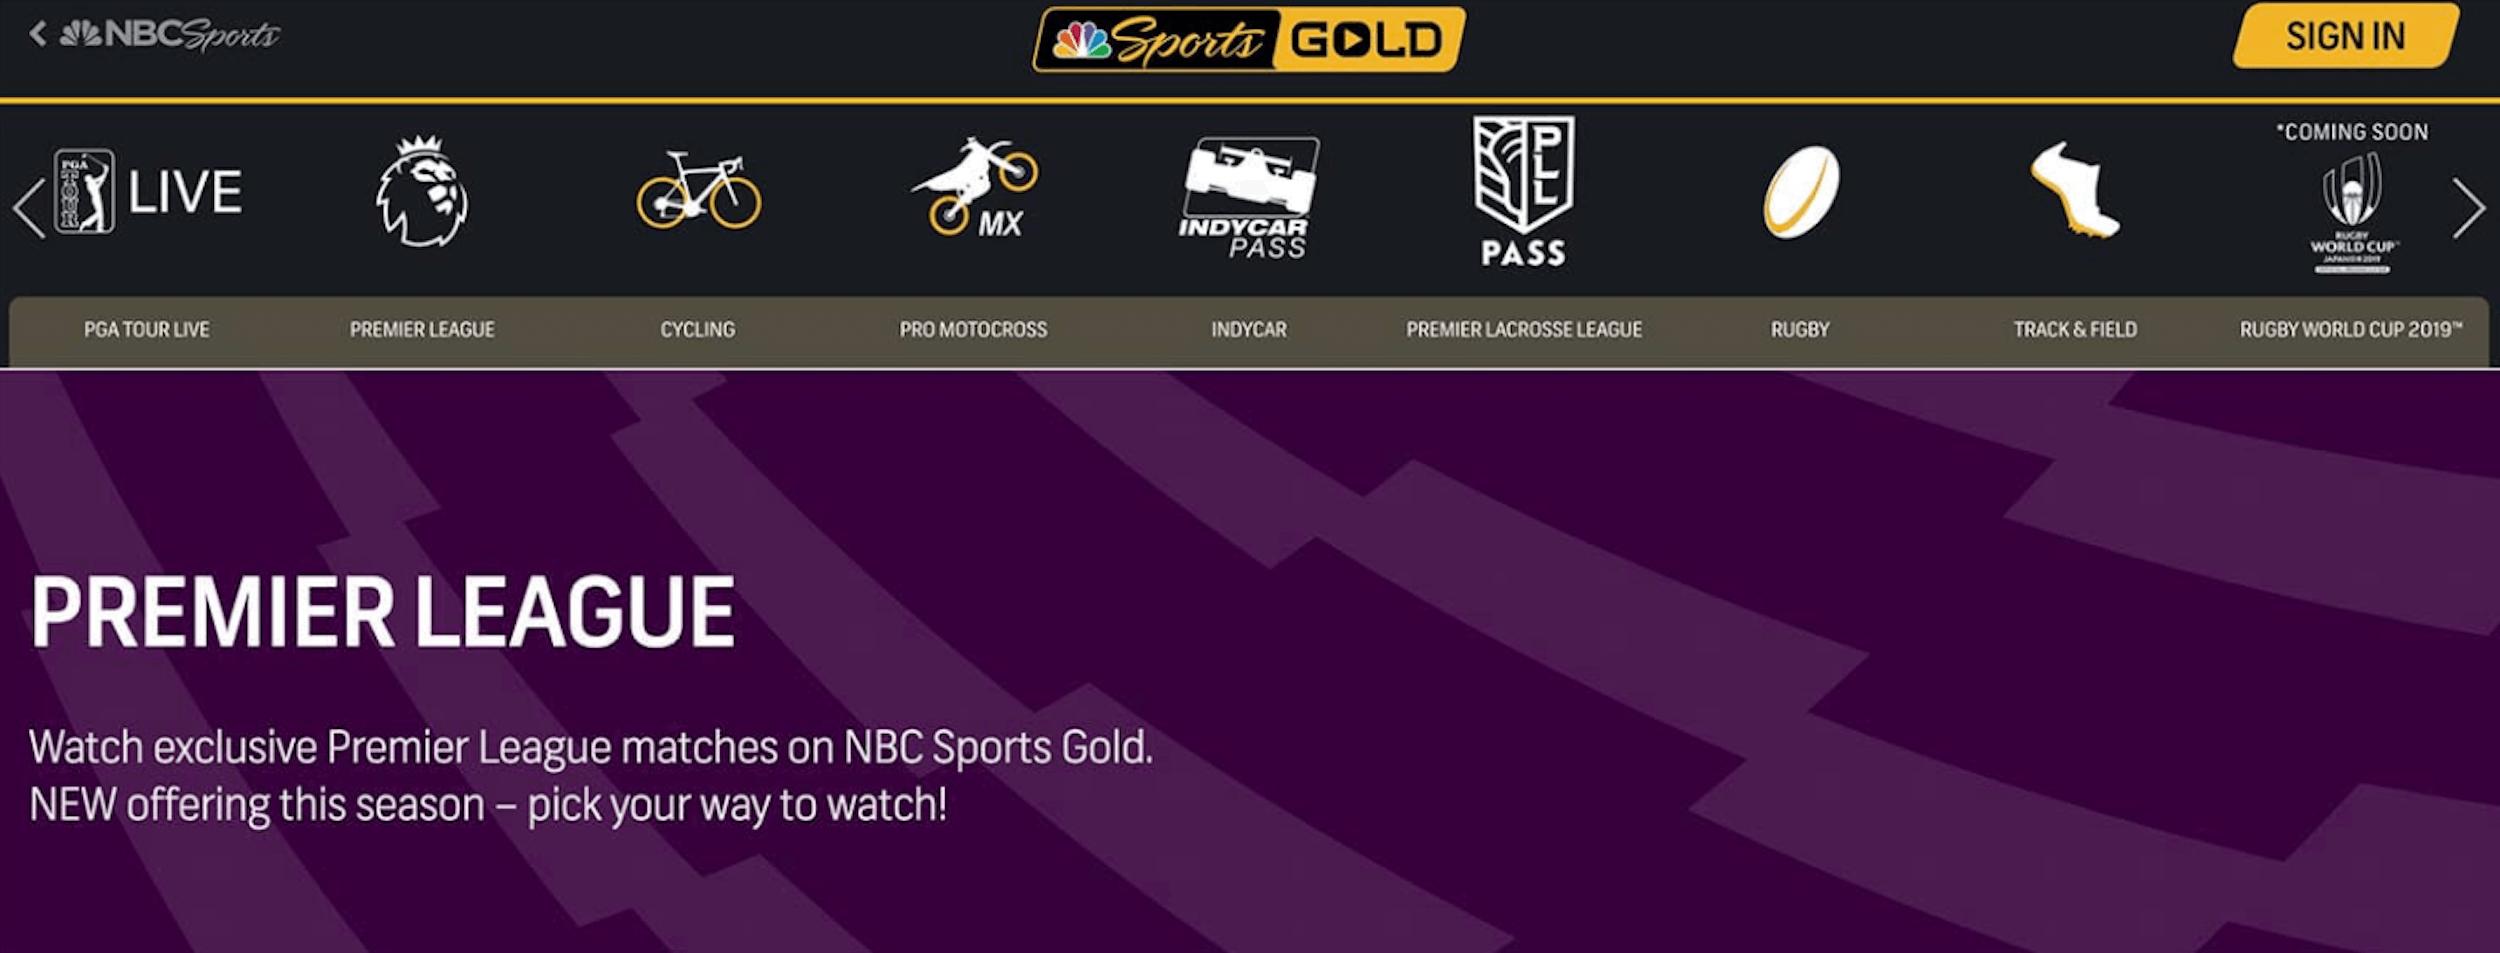 chelsea vs leicester city live stream NBC sports gold